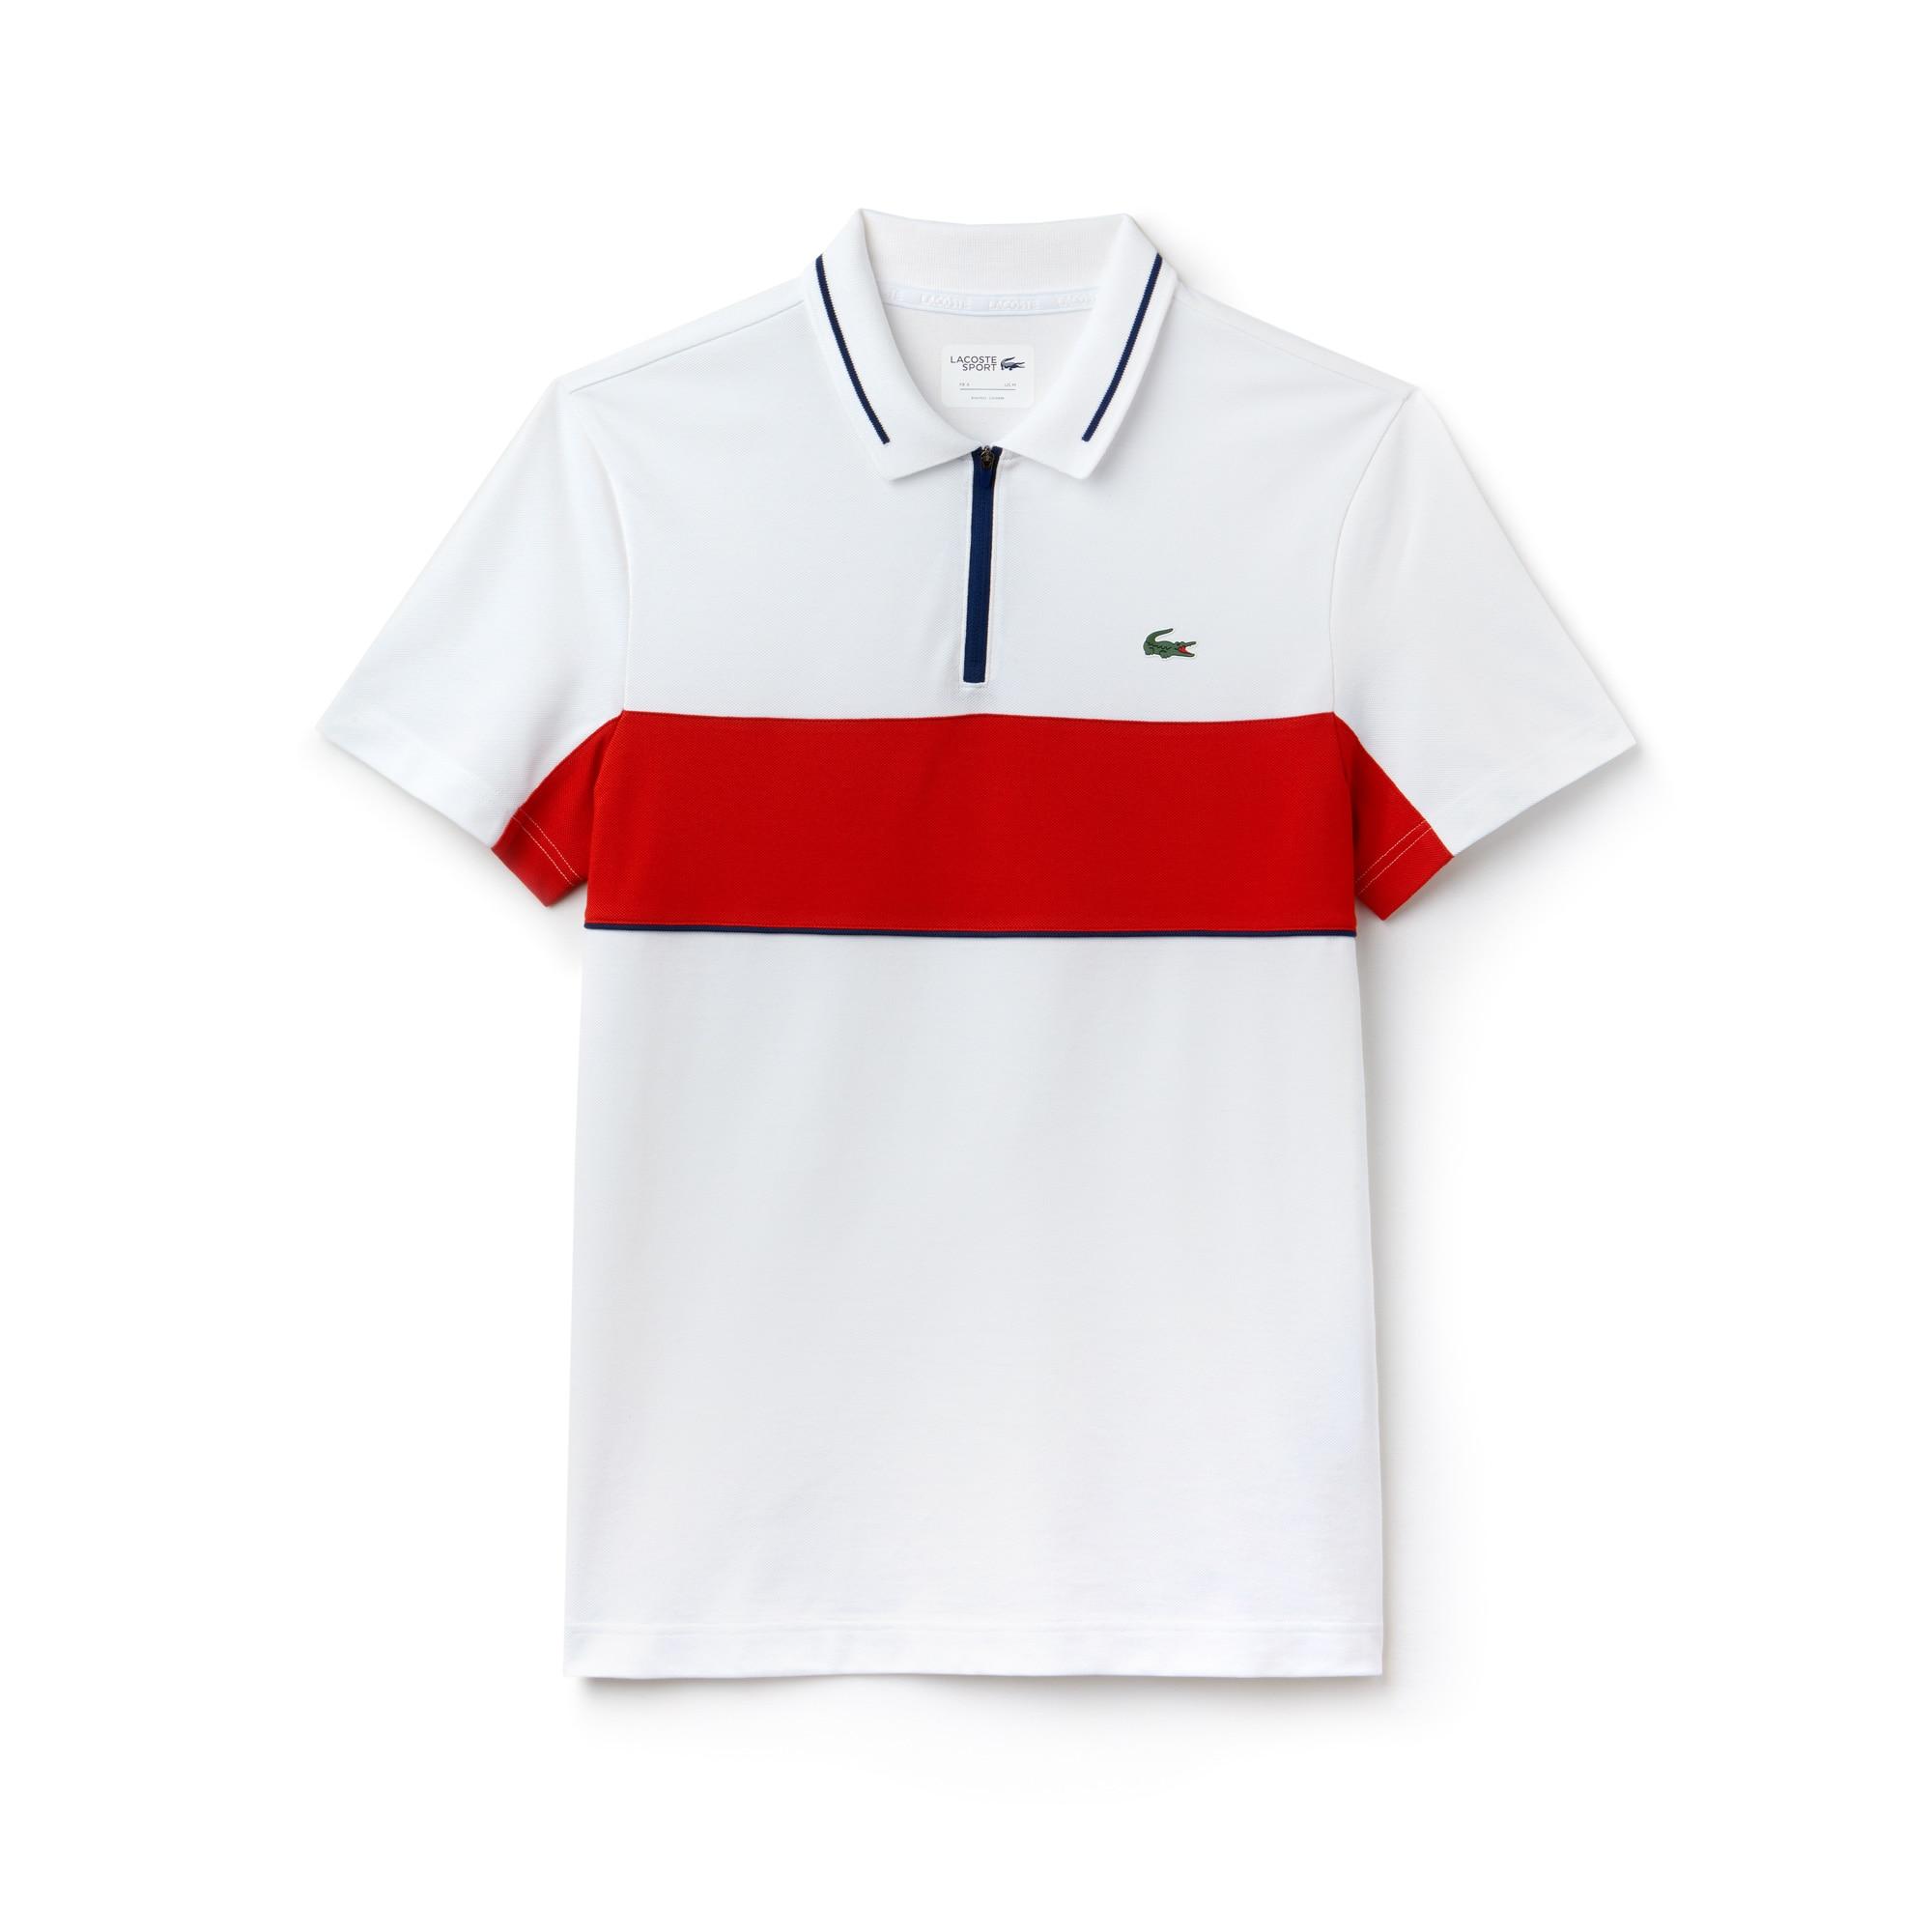 Men's SPORT Contrast Bands Technical Piqué Golf Polo